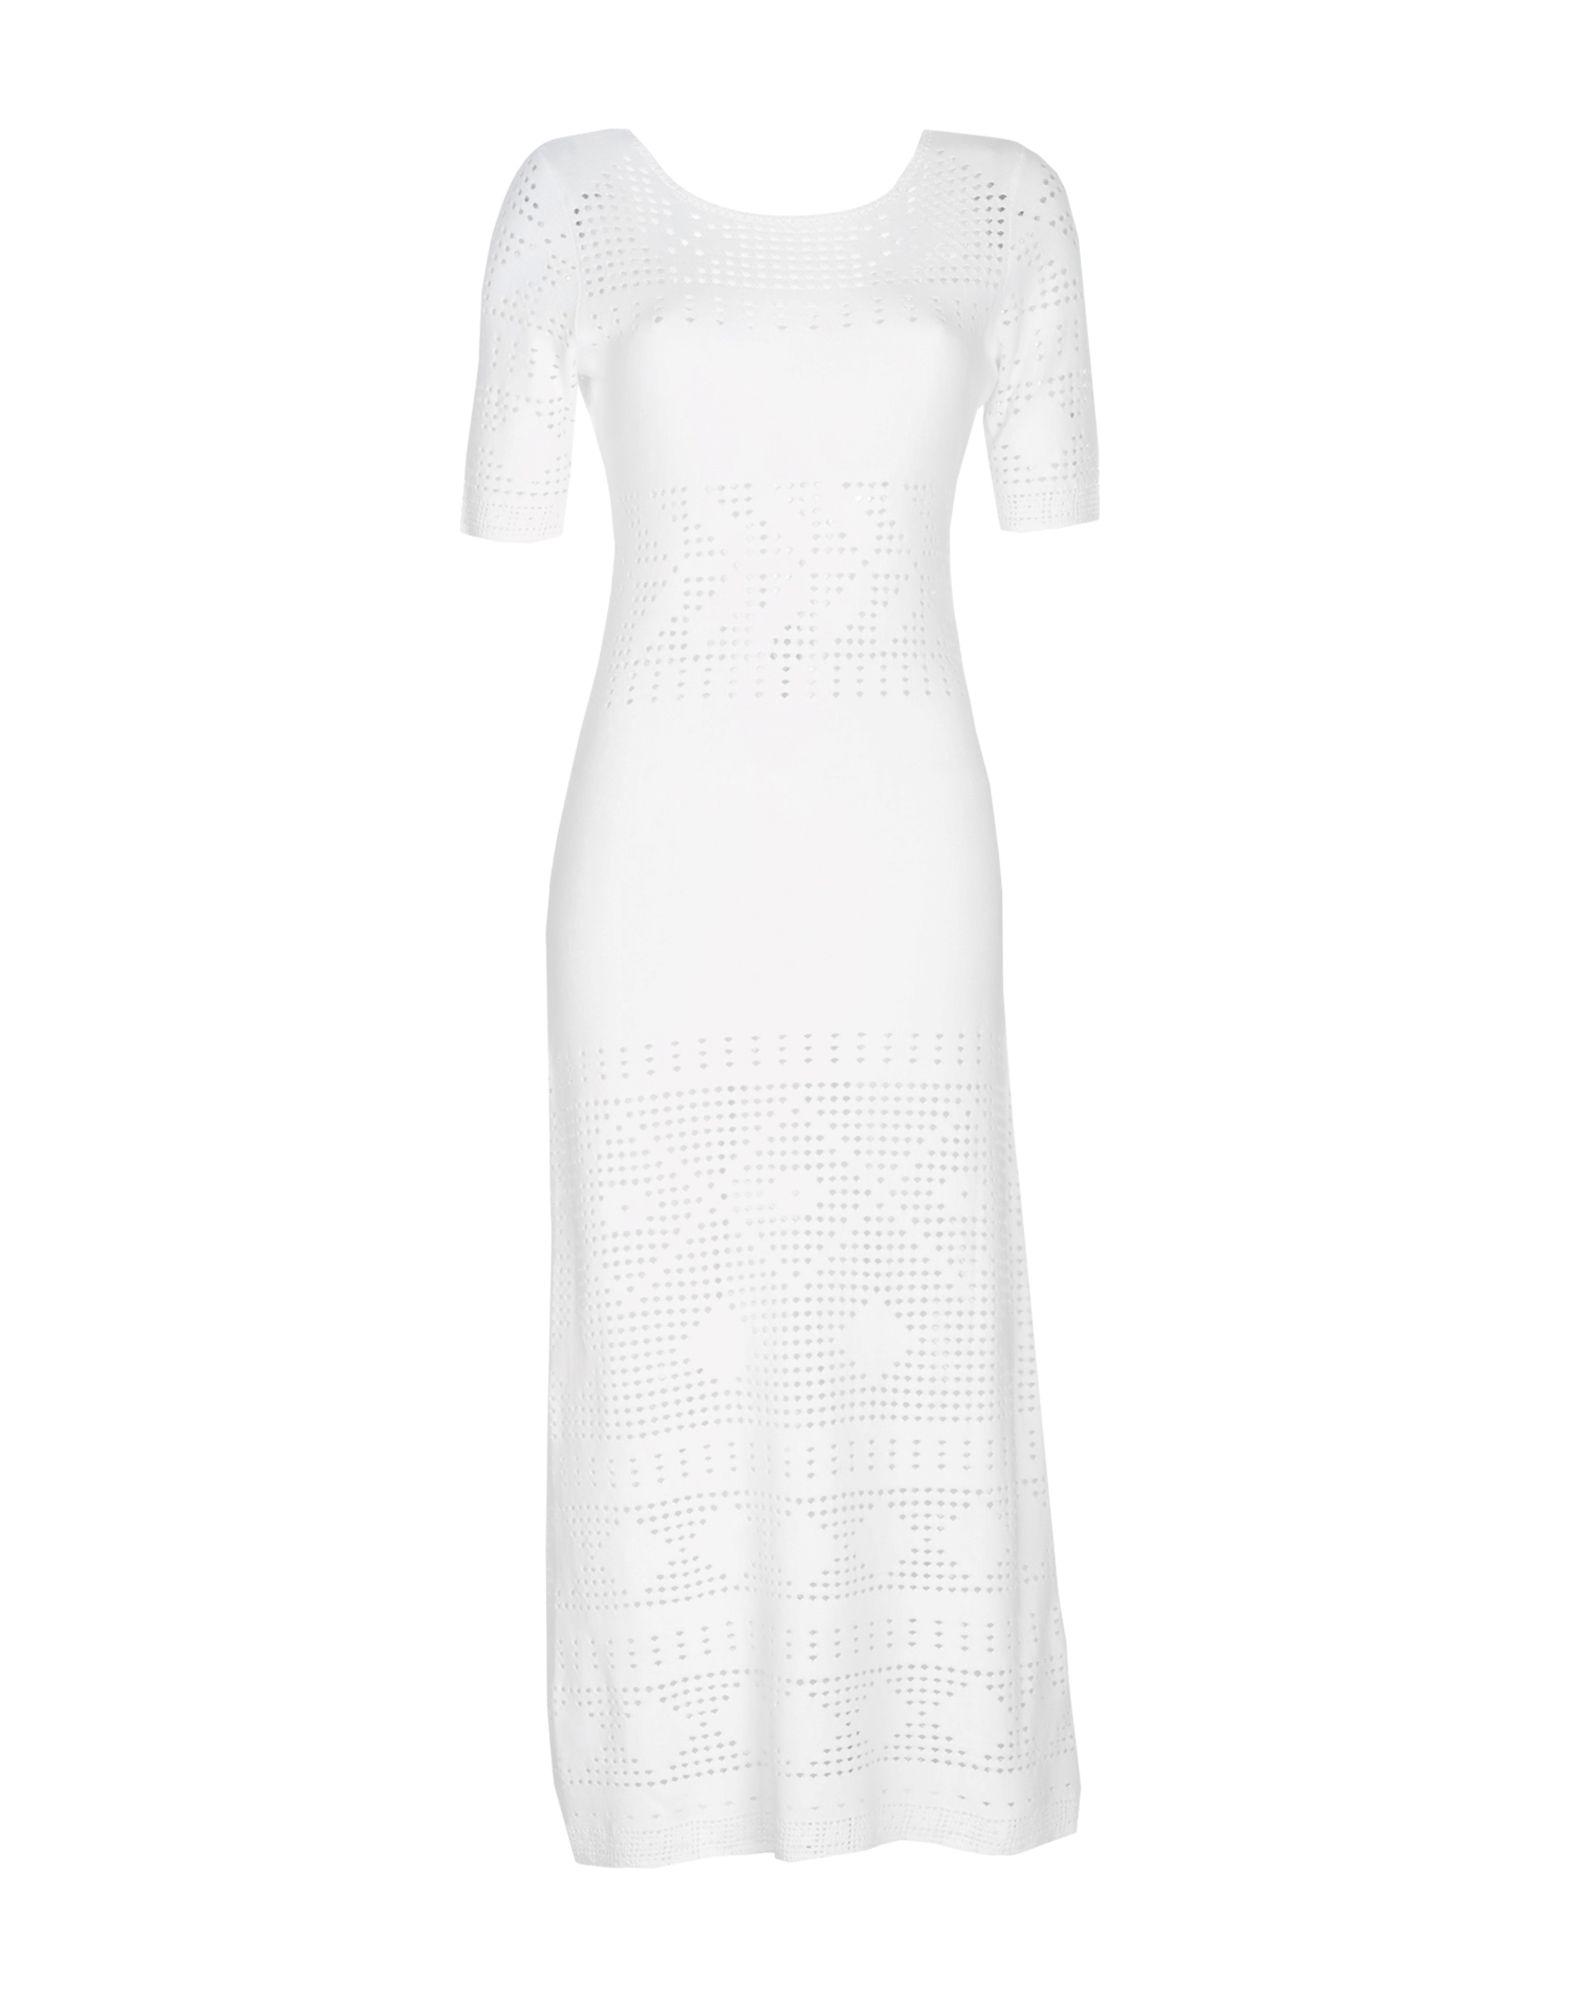 TSE Long Dress in White